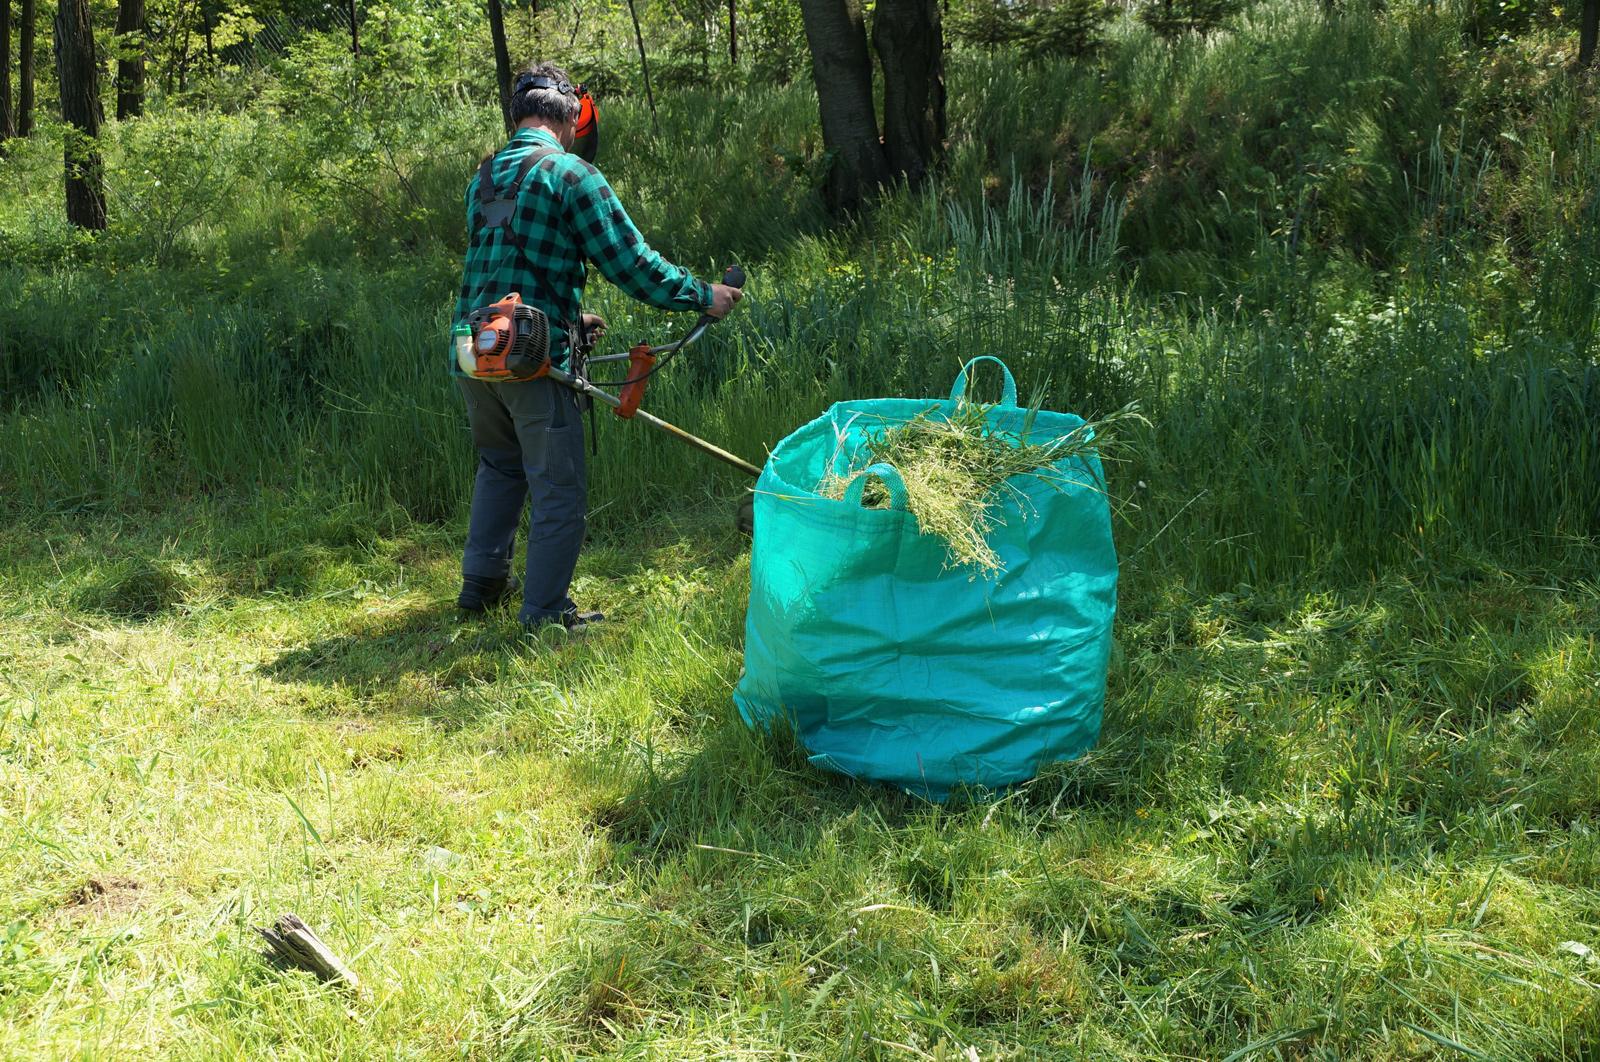 Garden Bag, worki do ogrodu